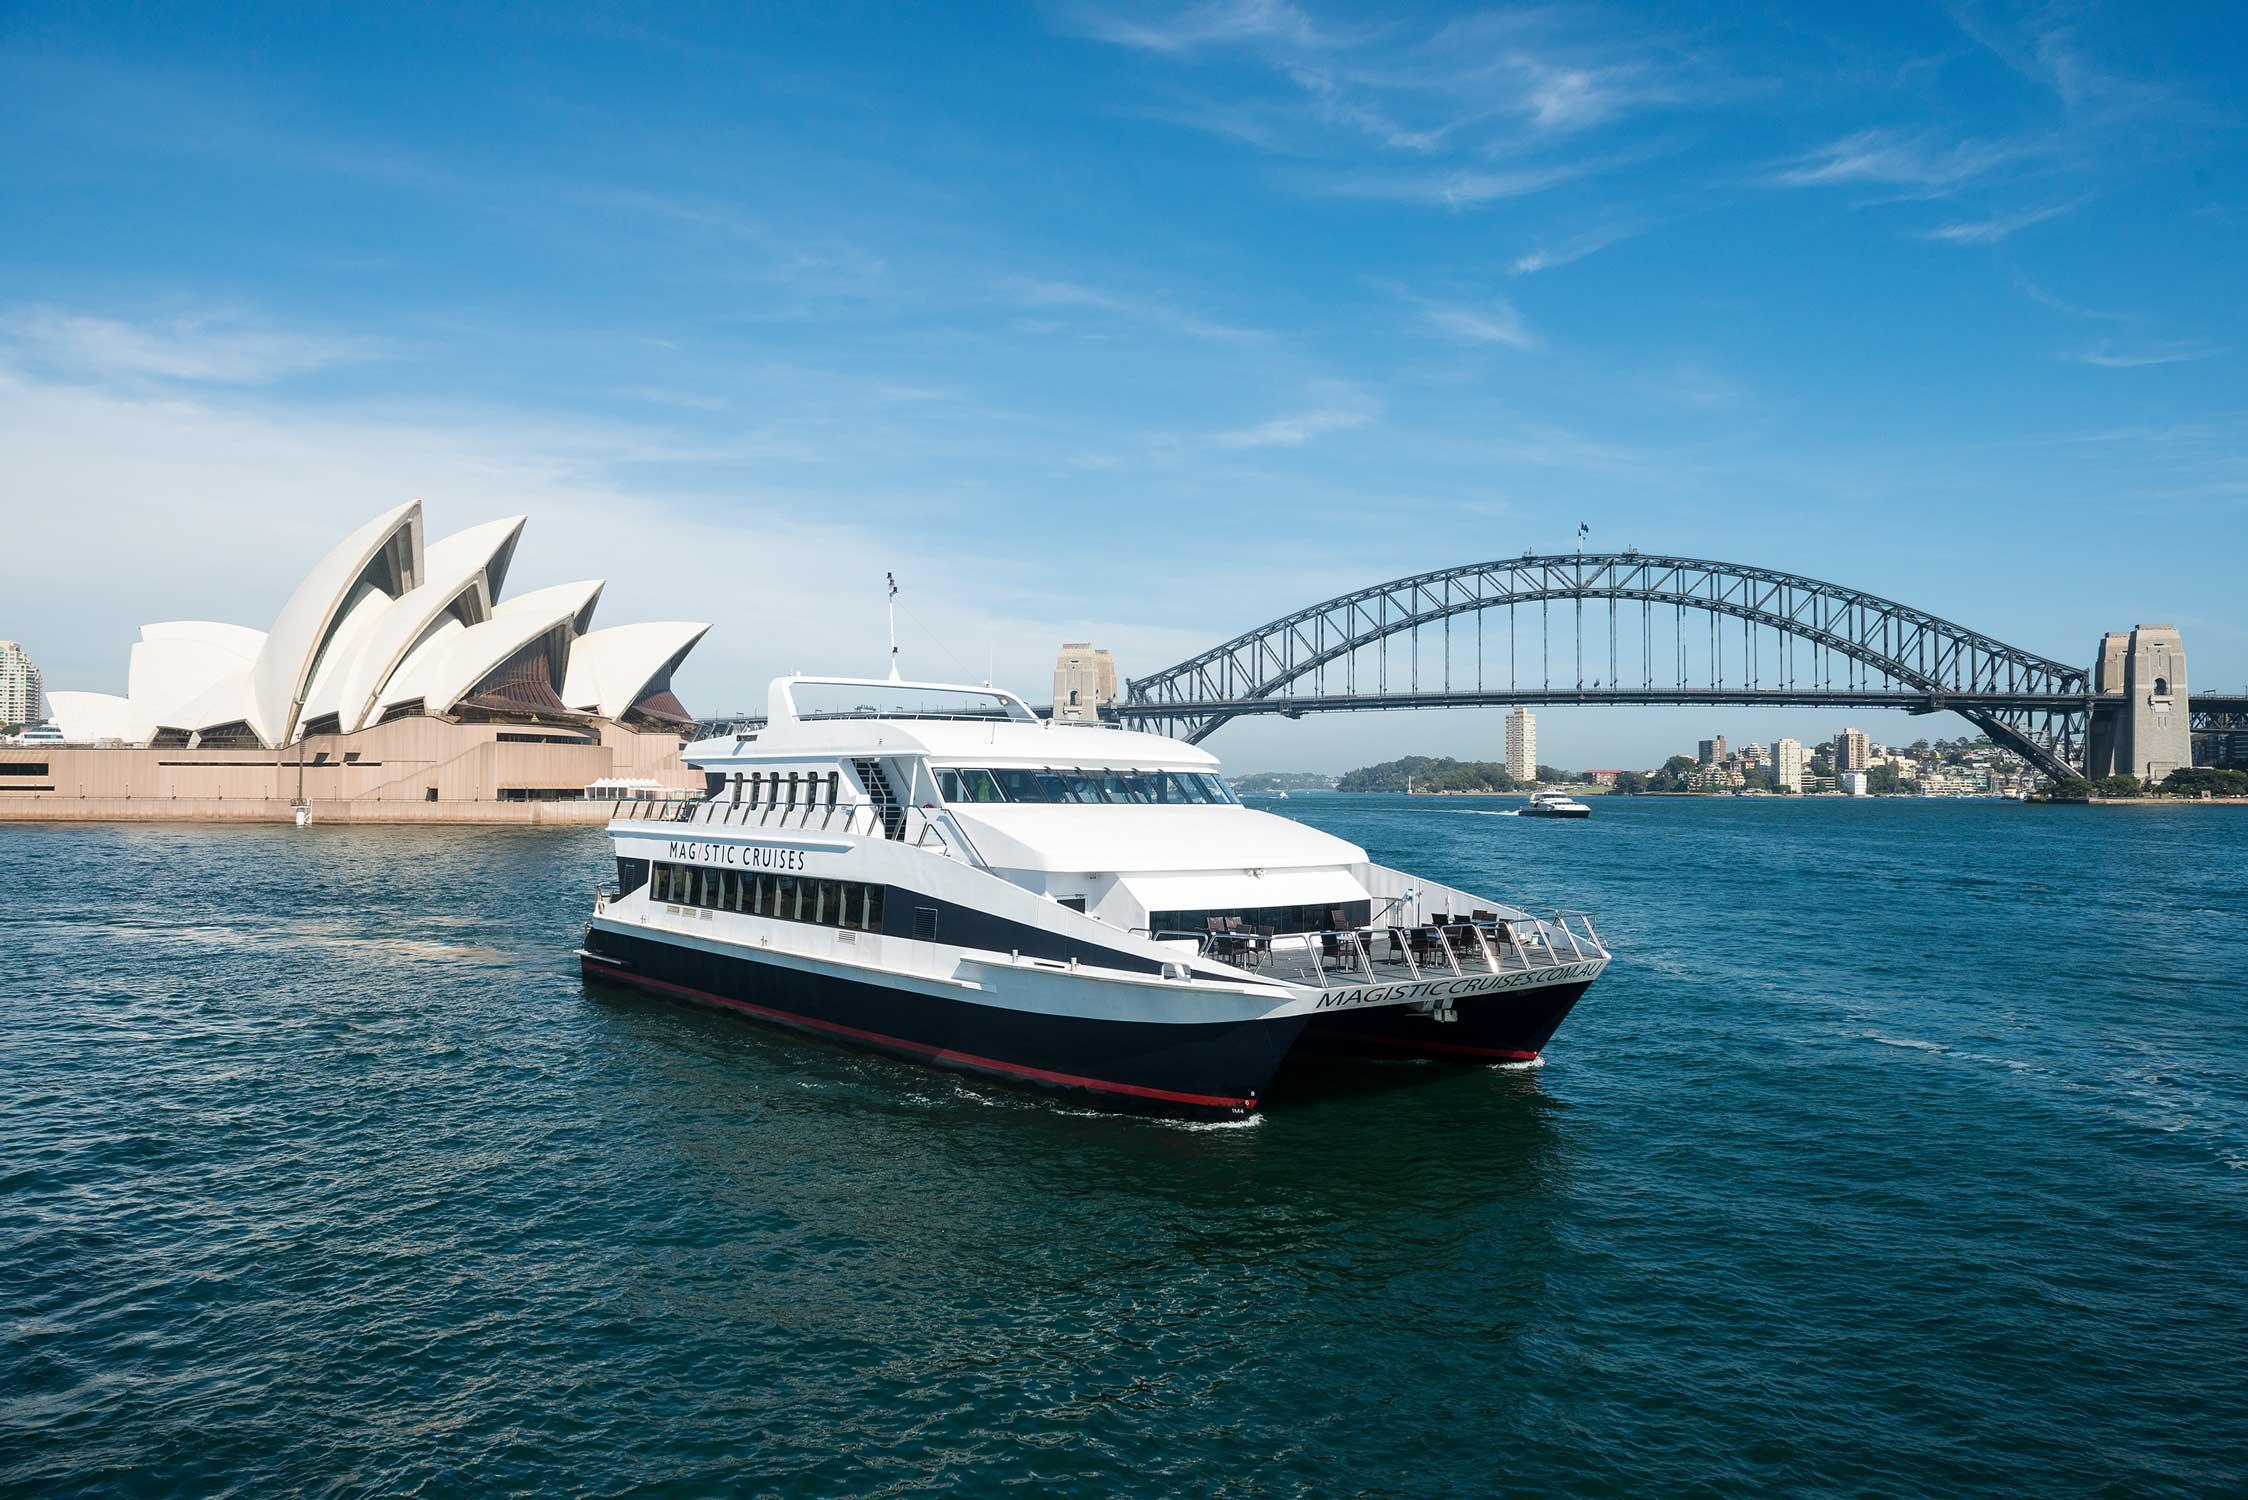 Best day touring ideas in Sydney